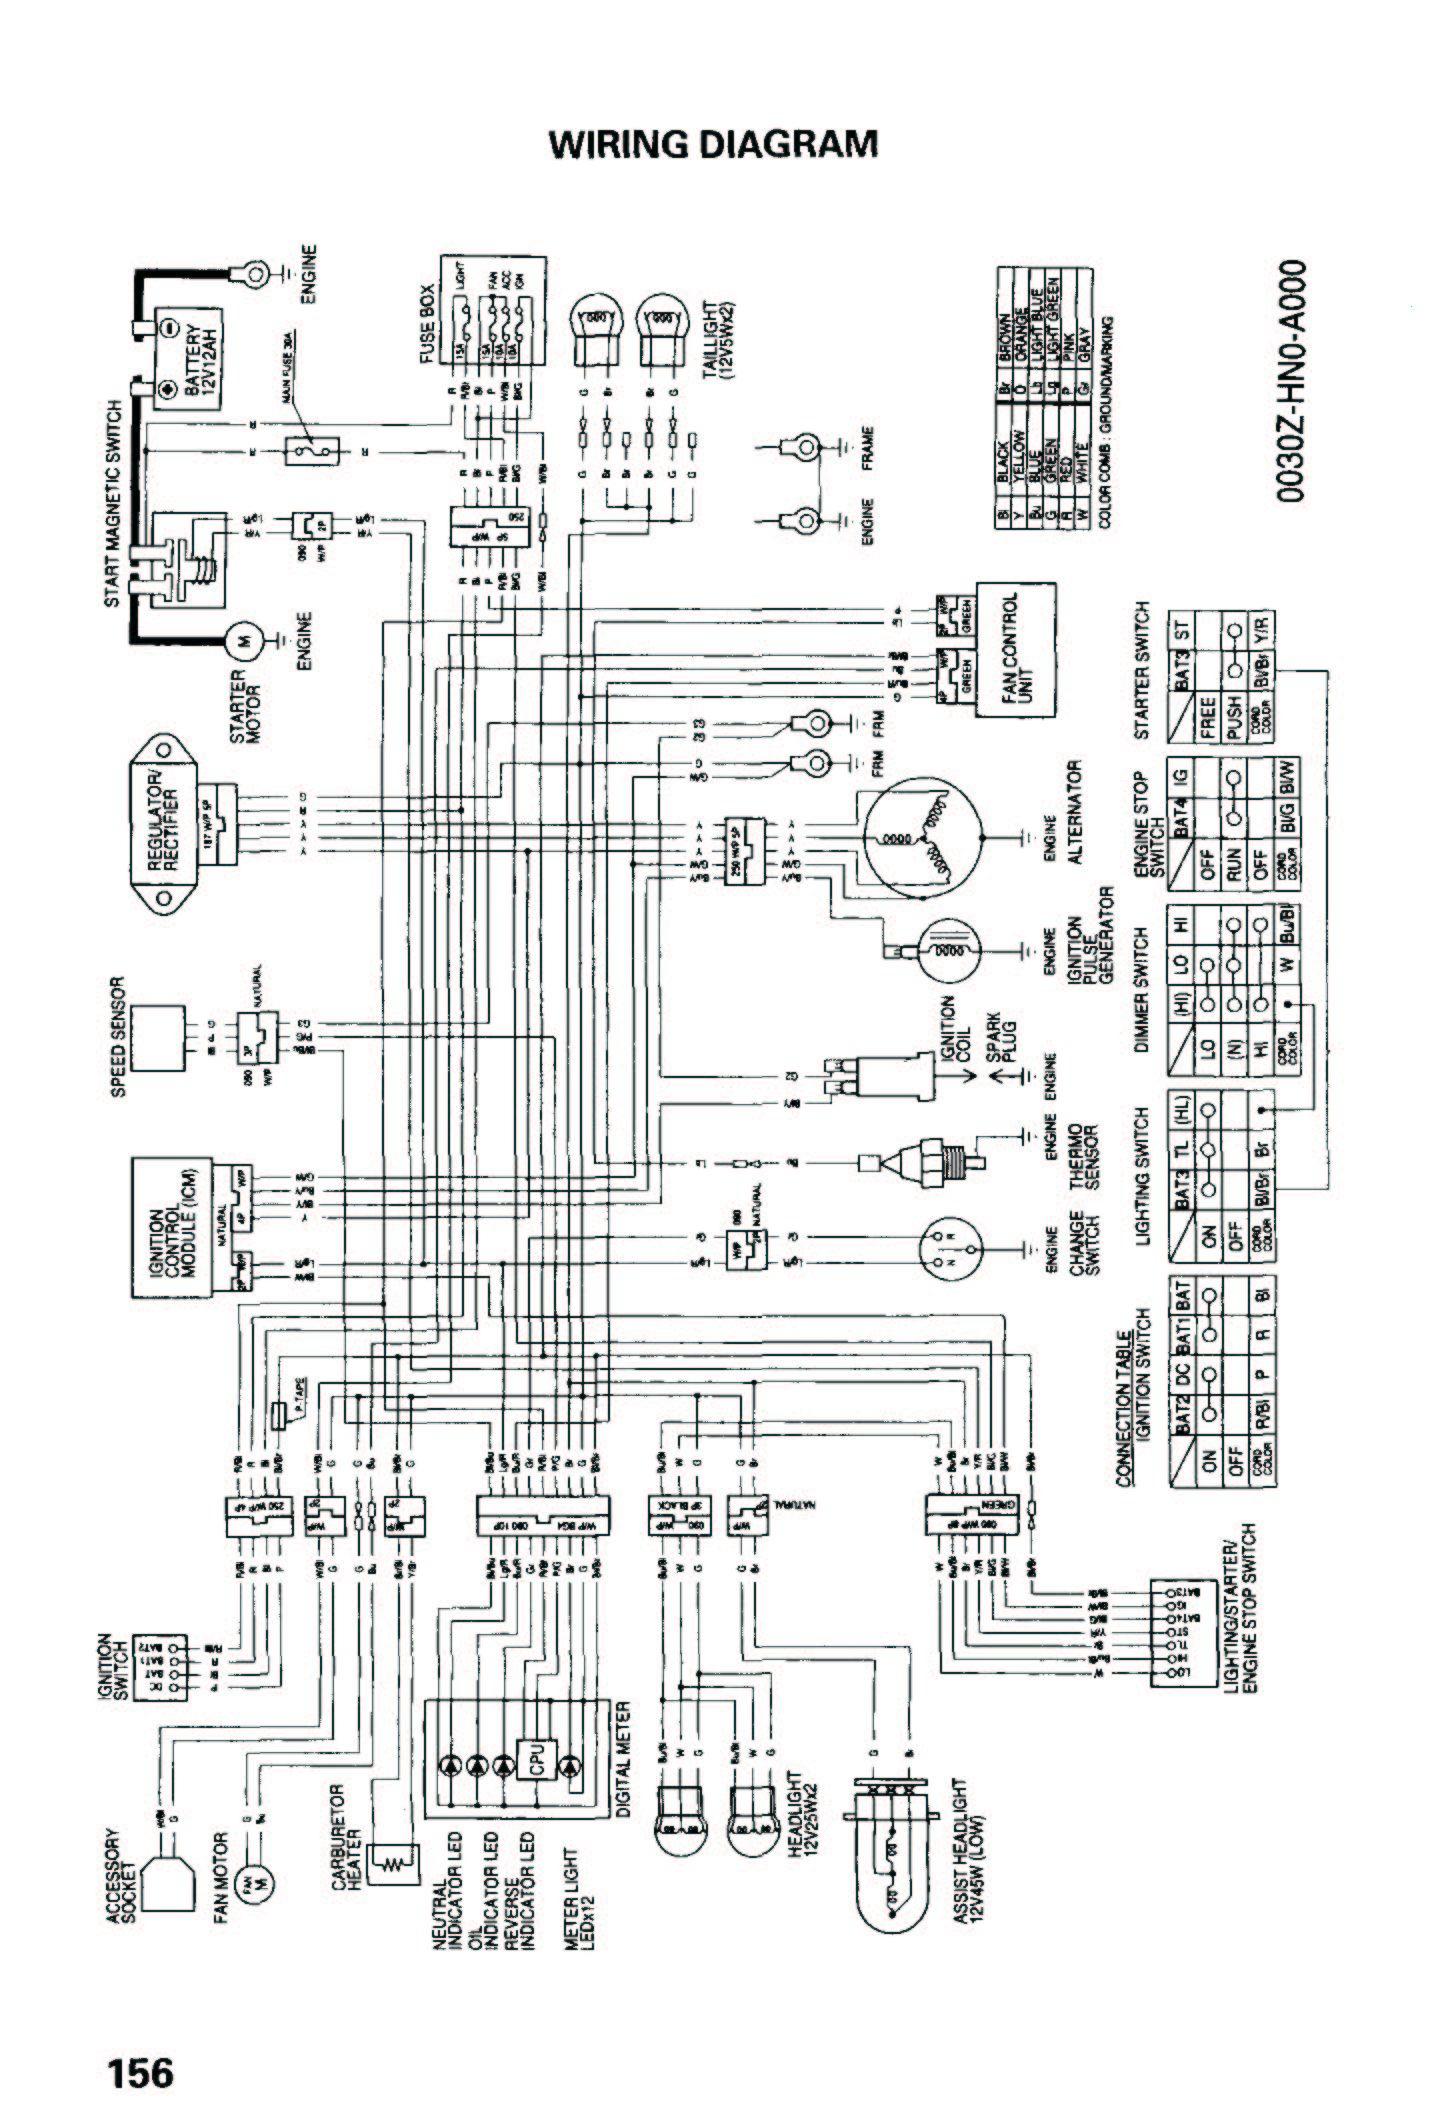 Honda 500 Rubicon Wiring Diagram